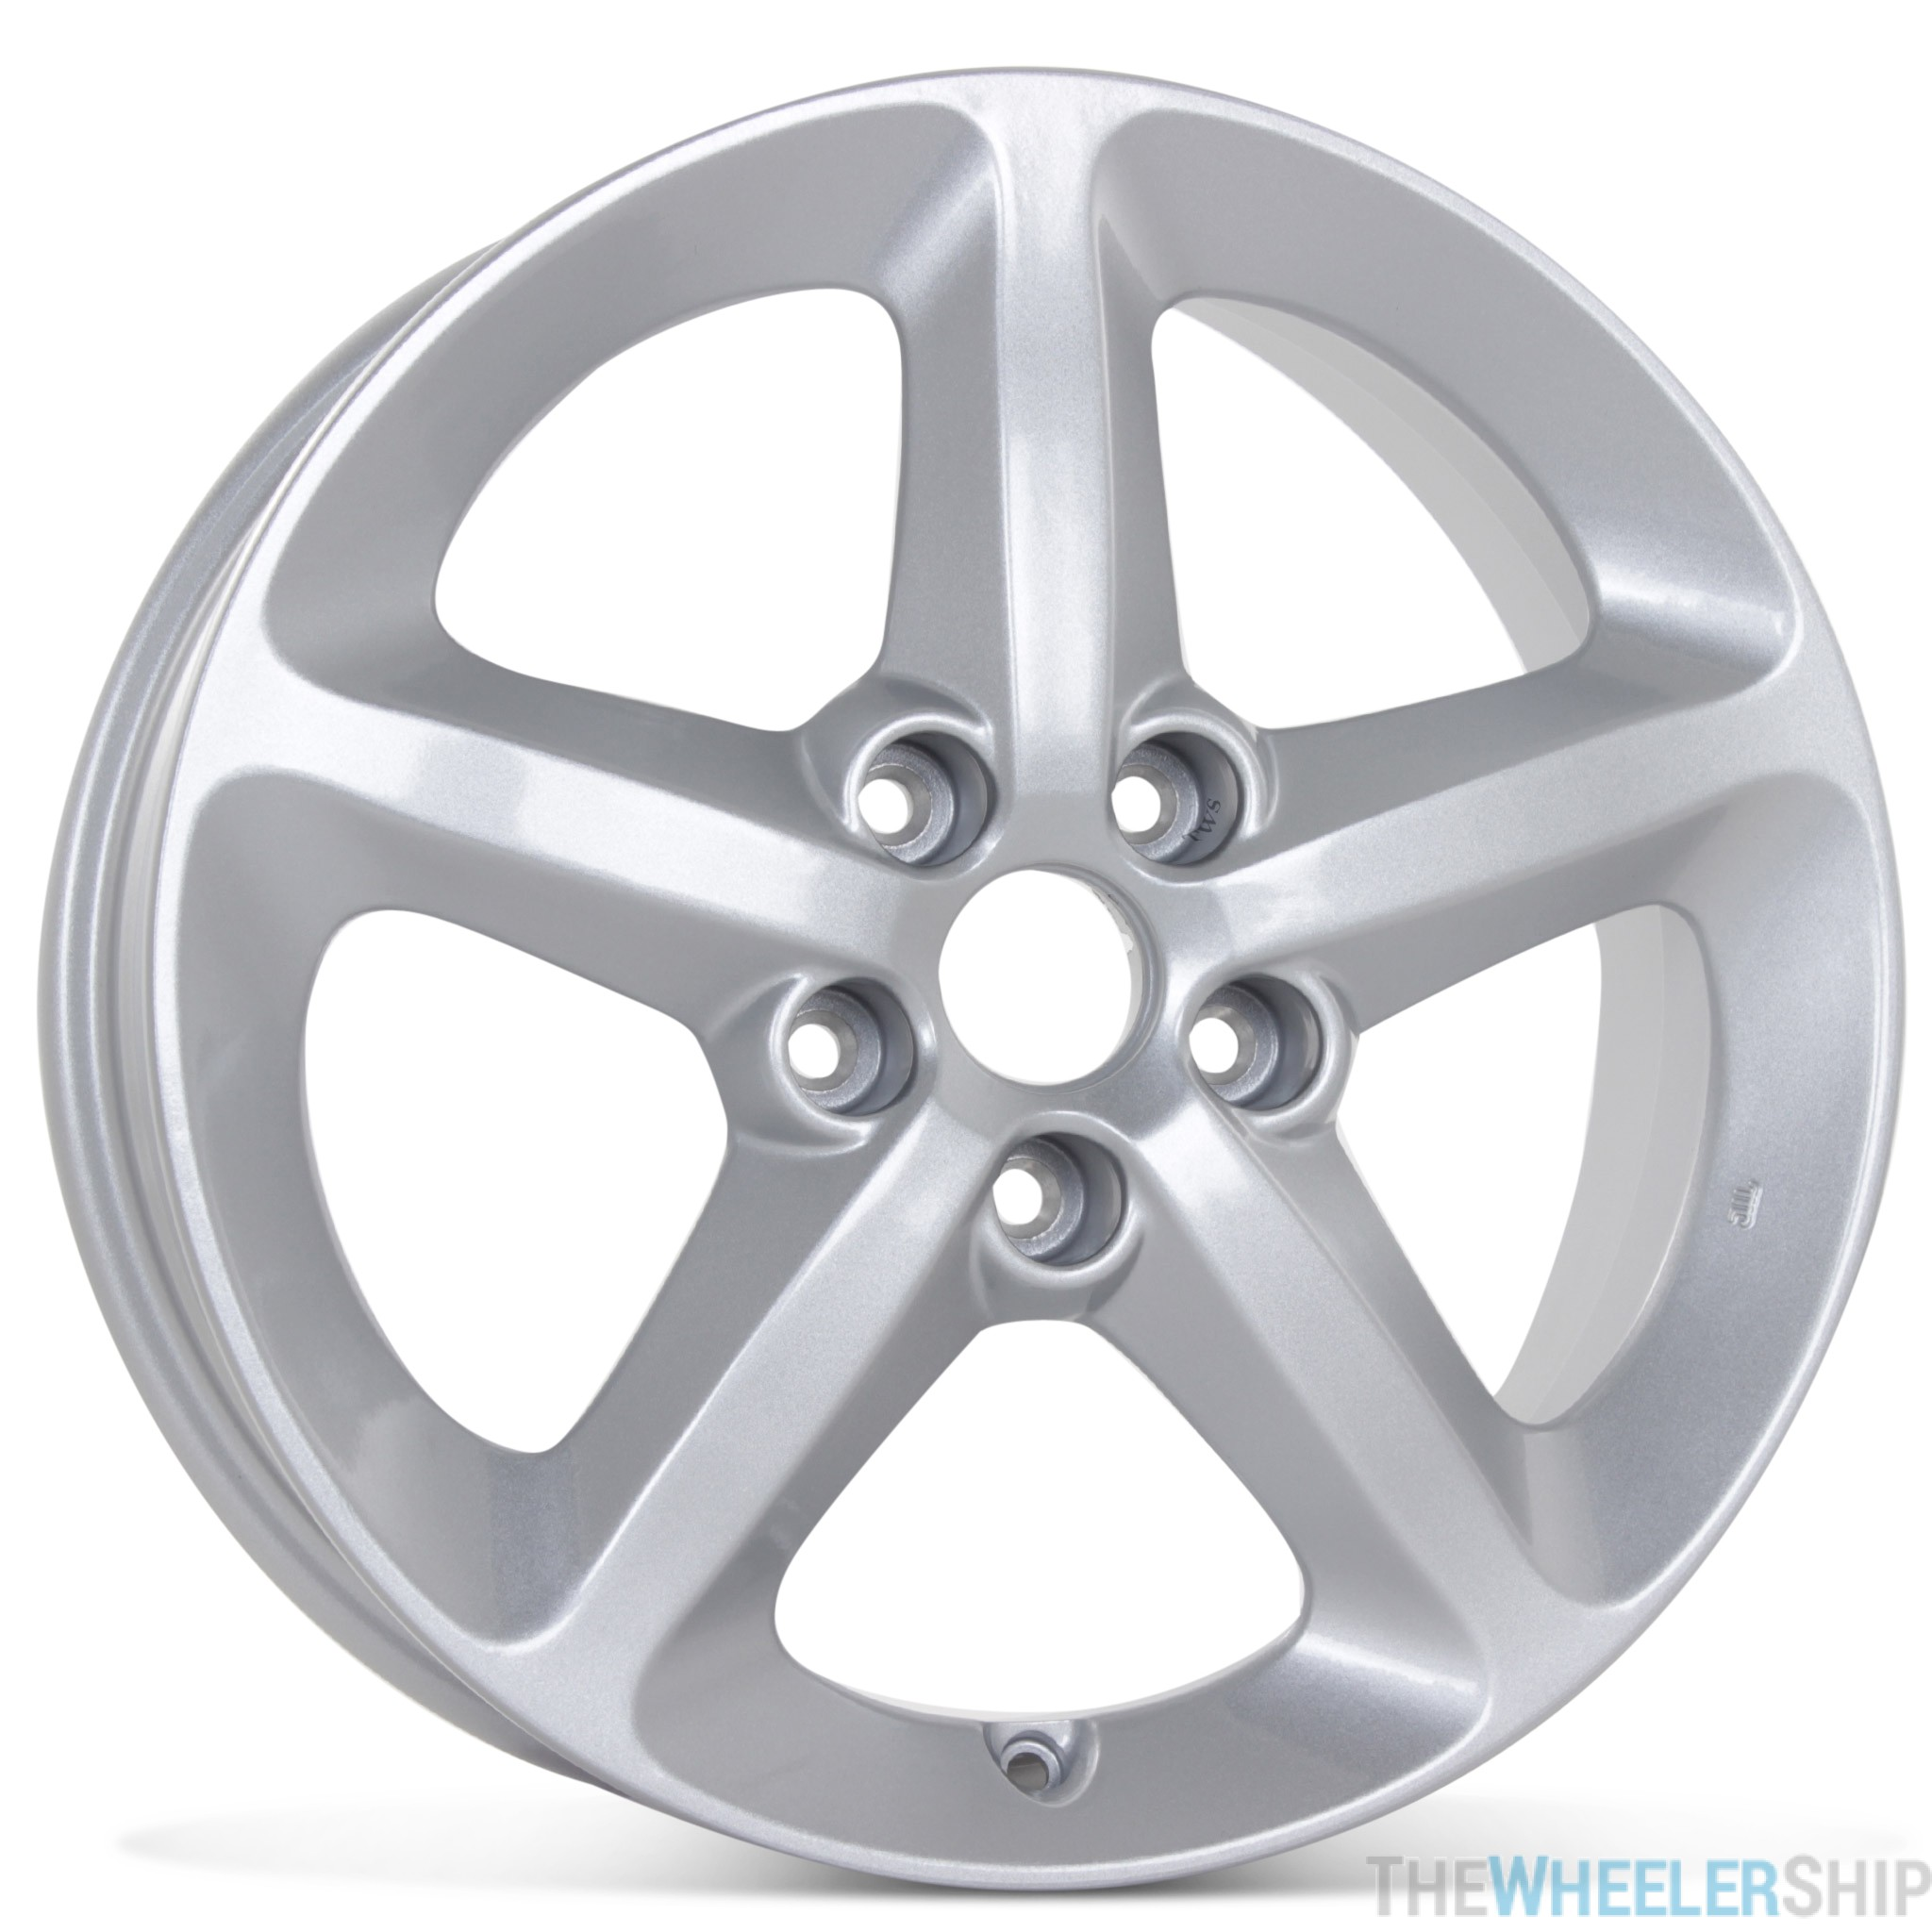 "2006-2010 Hyundai Sonata Wheels for Sale   17"" Hyundai Wheels"